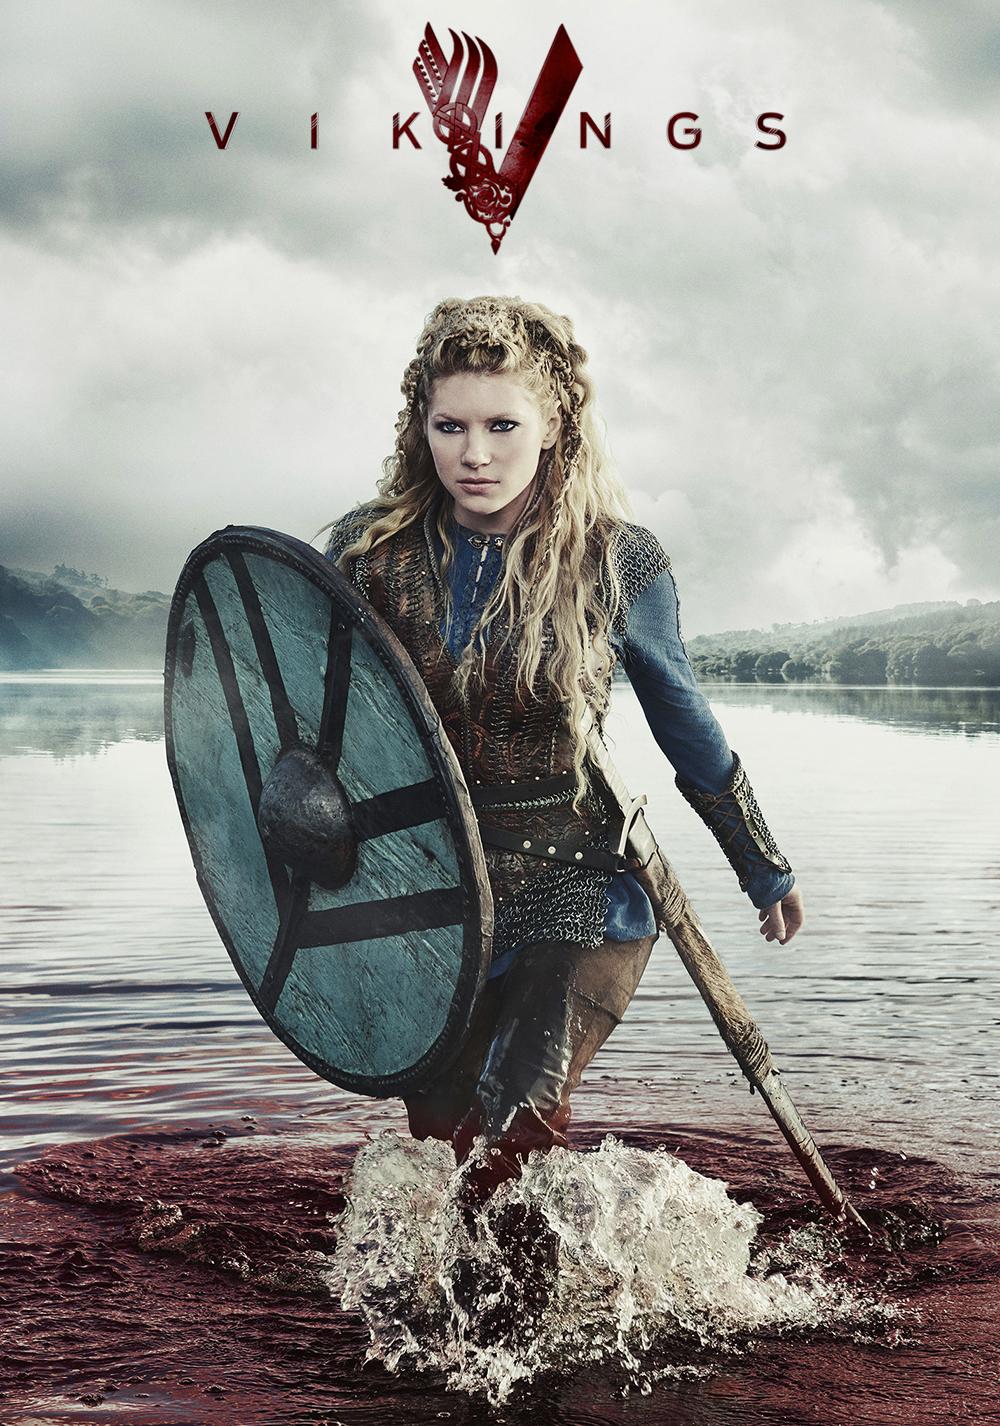 Schildmaid Vikings